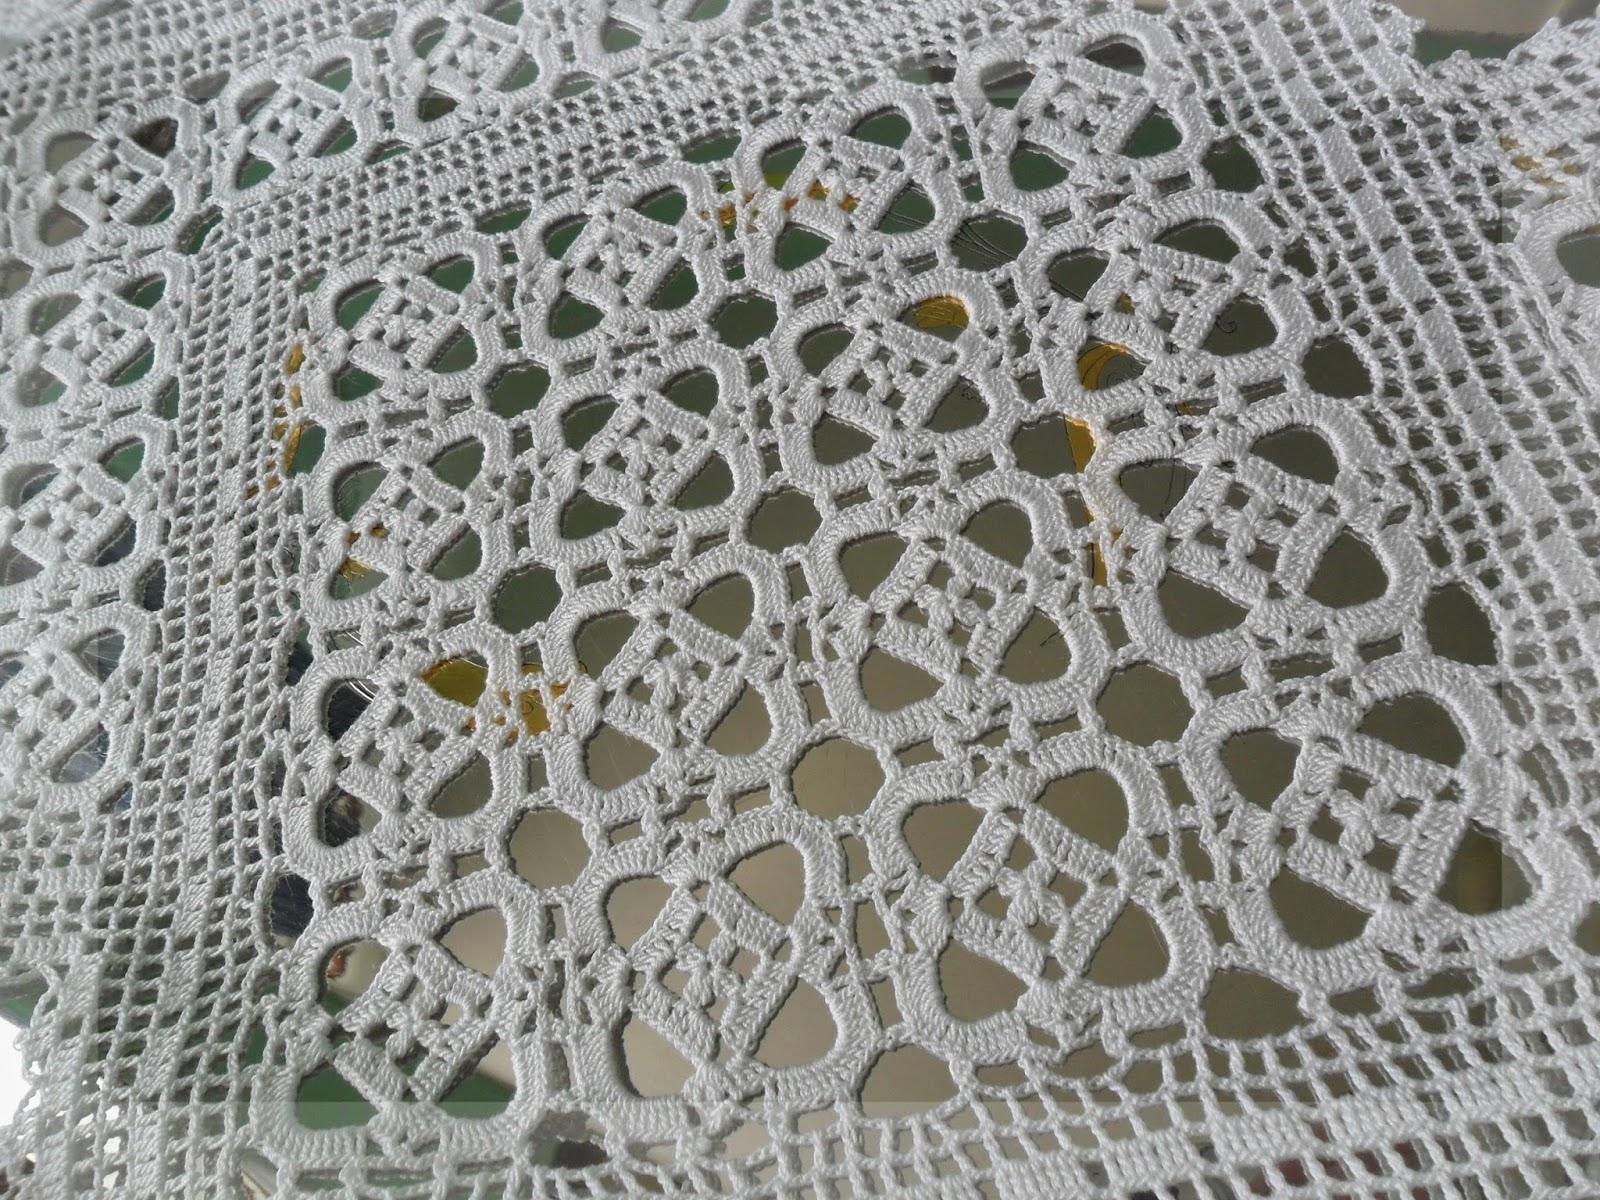 crochet doily patterns with diagram 2001 honda accord wiring ergahandmade 43 diagrams